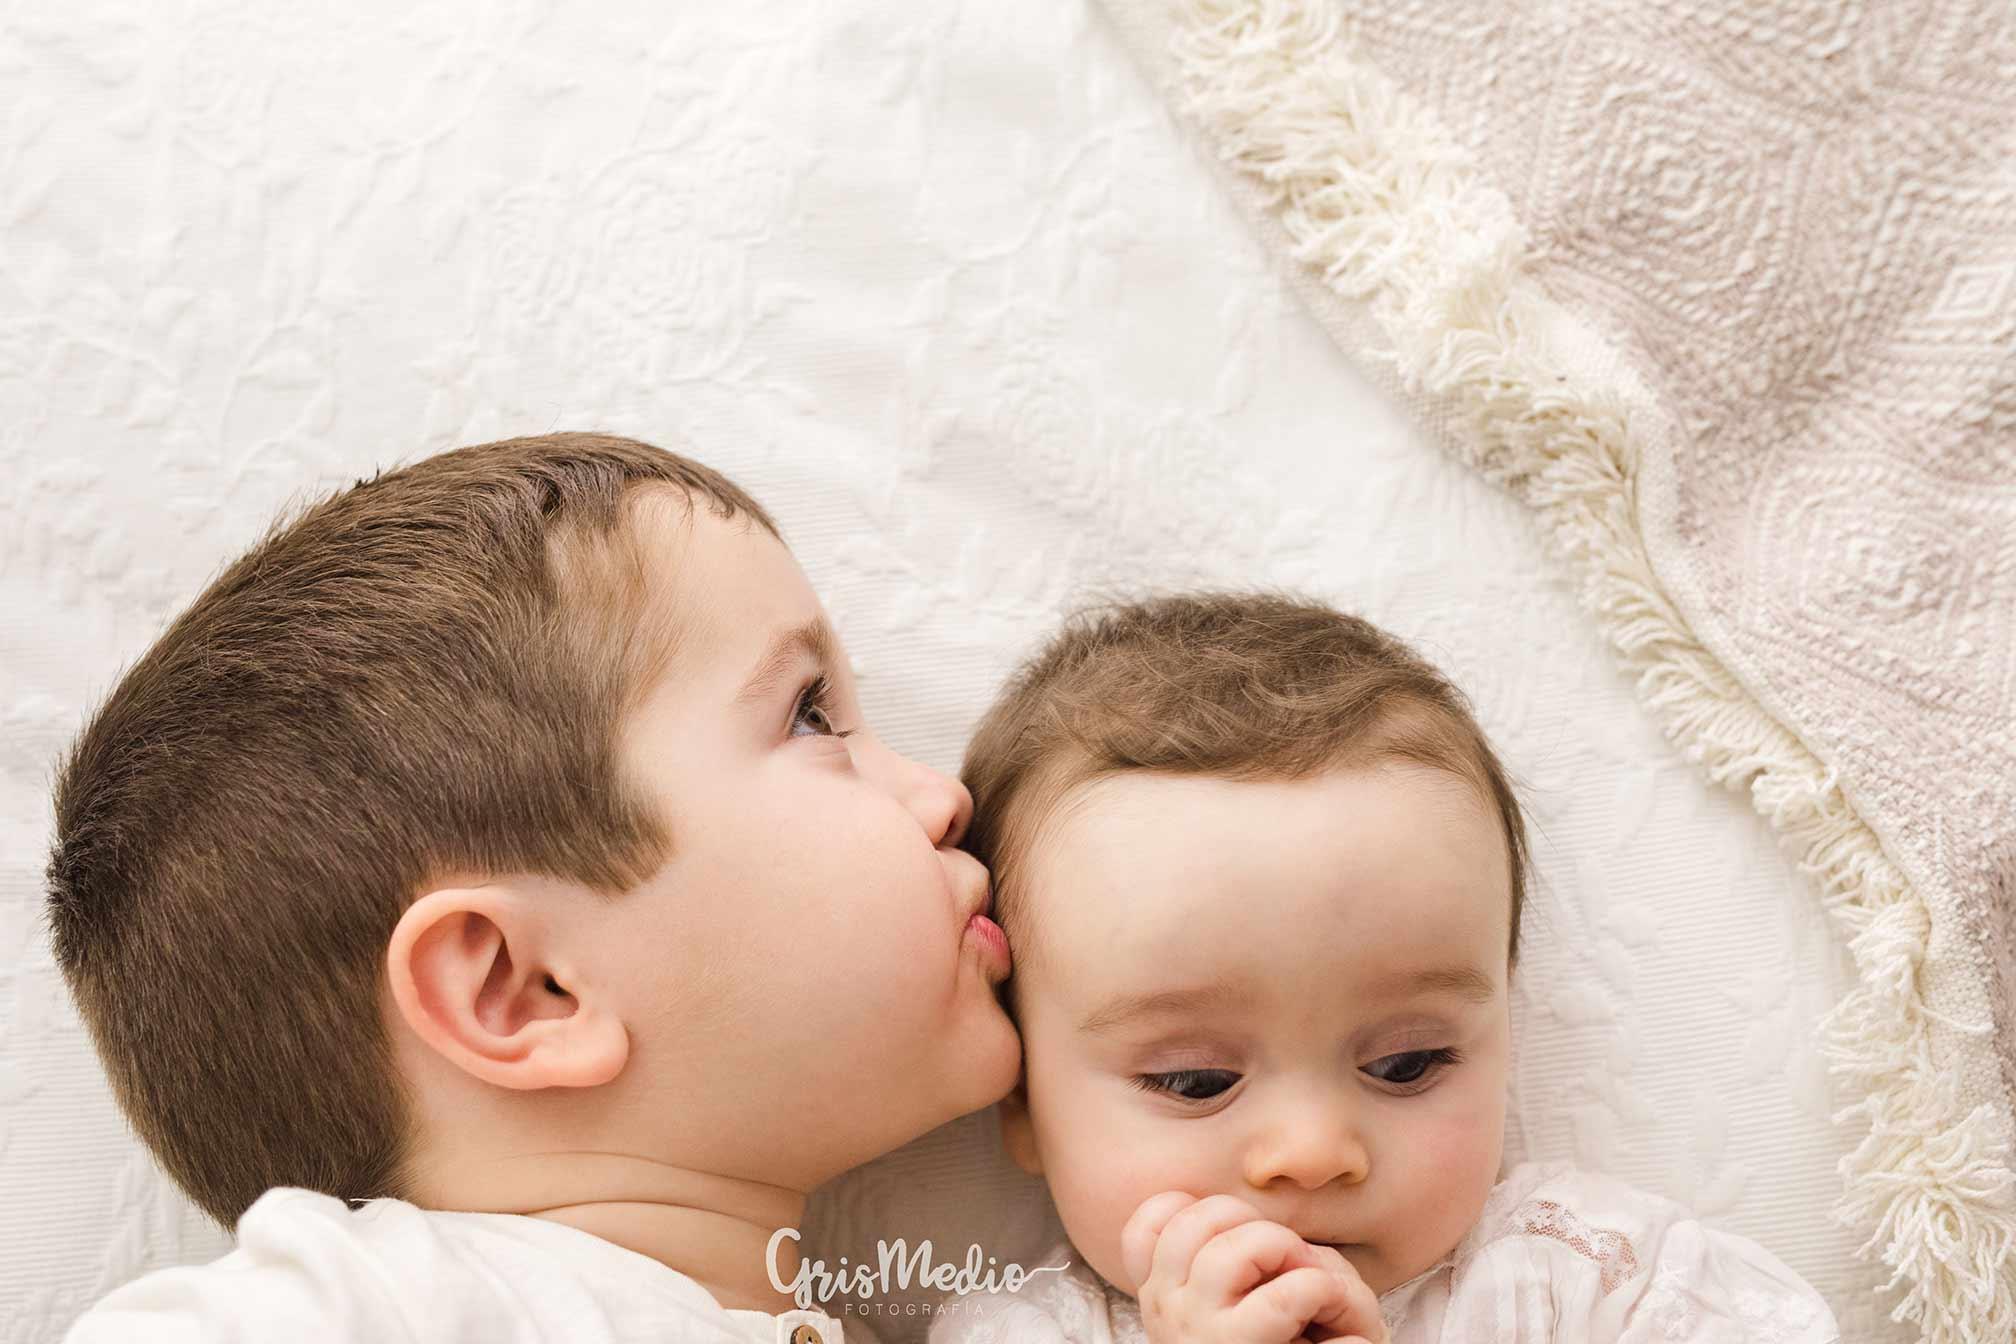 fotografia-familia-infantil-zaragoza-grismedio-bebe-lactancia28